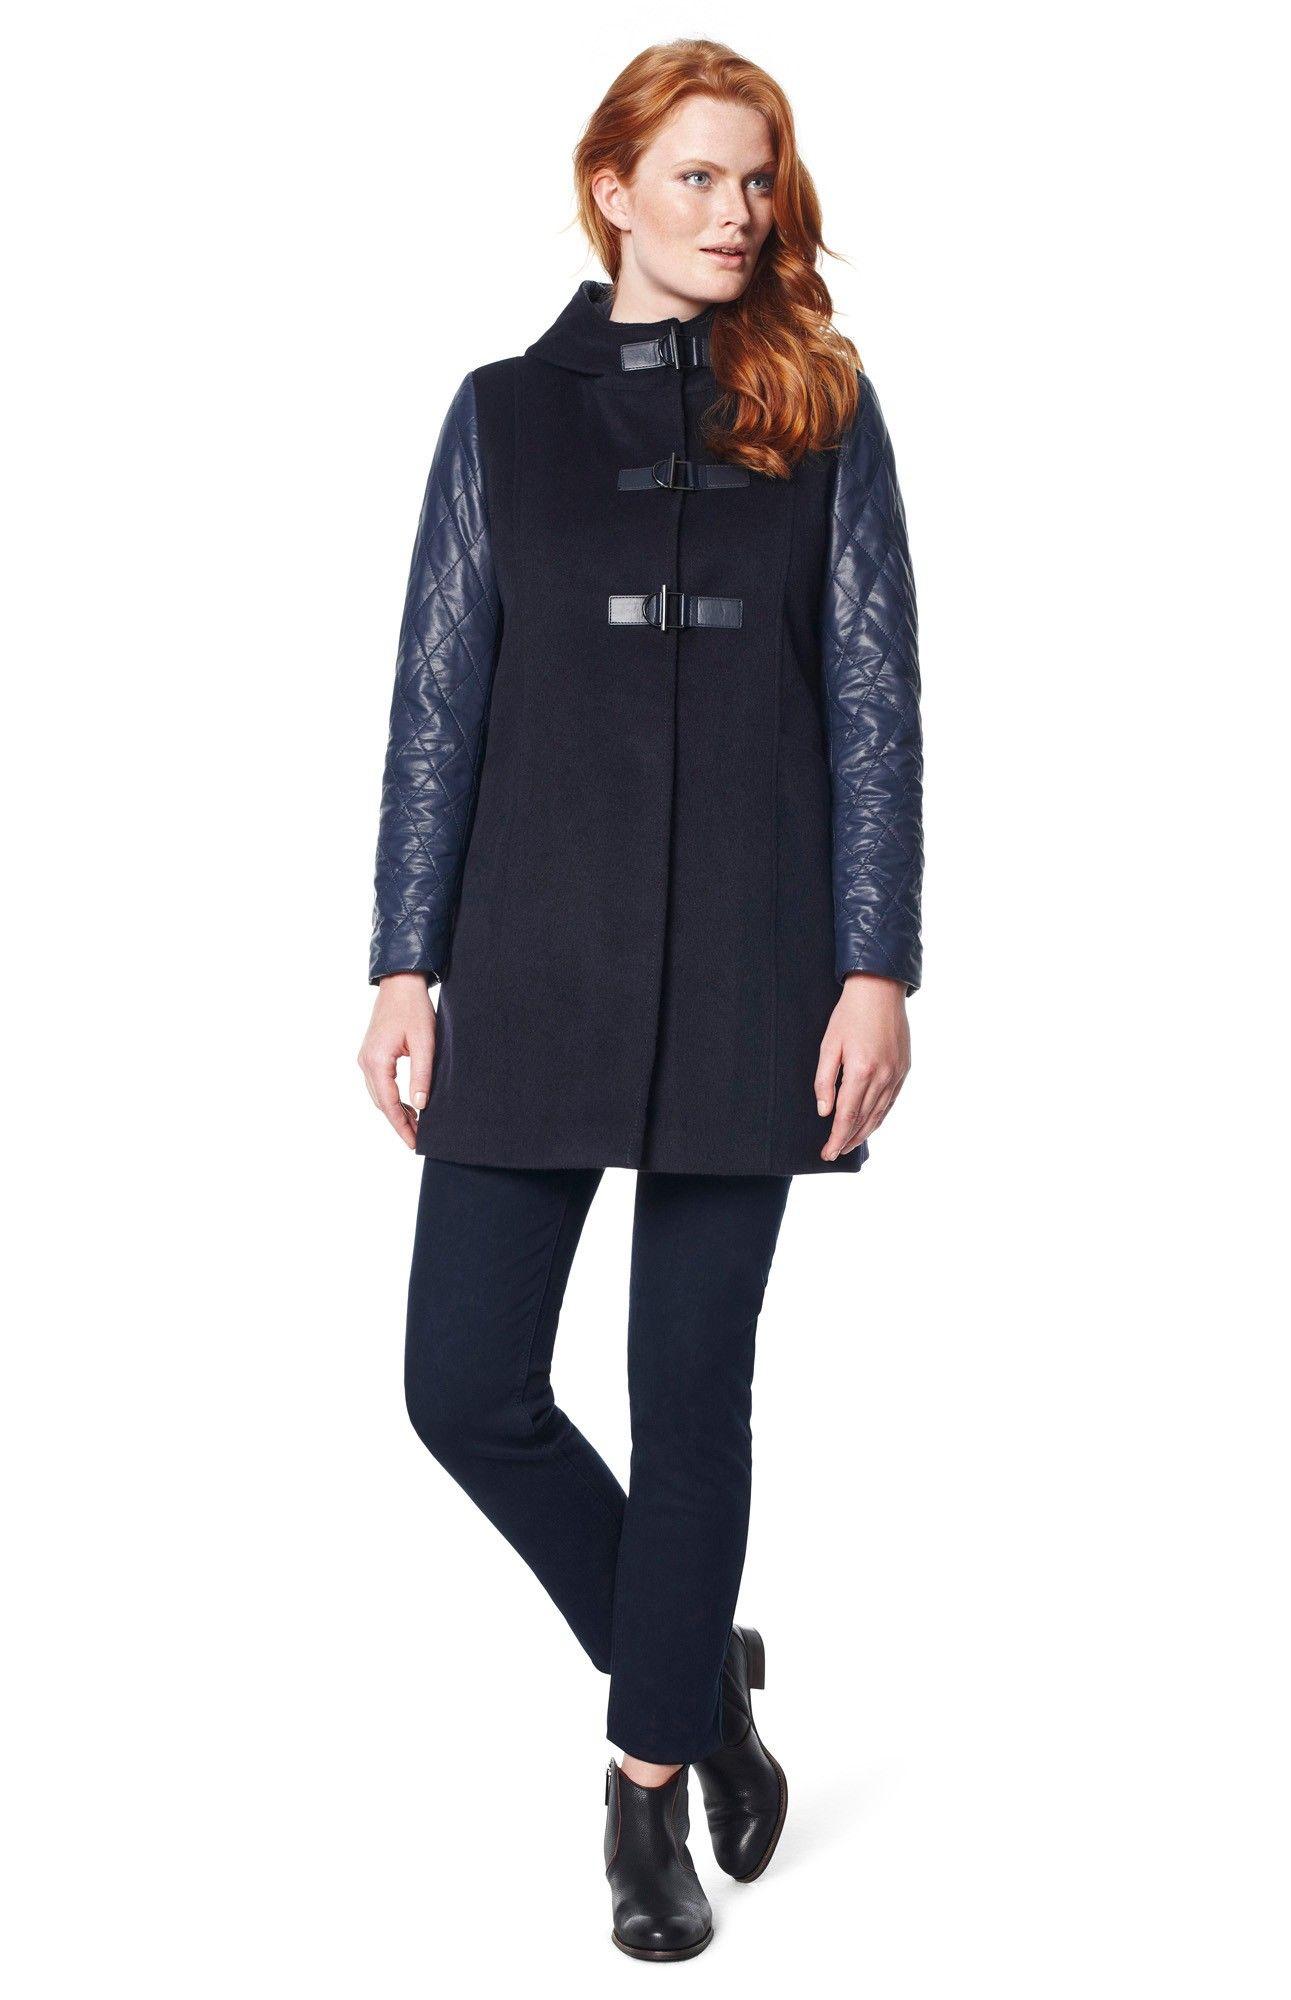 Chaquet n combinado abrigos chaquetas adolfo for Abrigos adolfo dominguez outlet